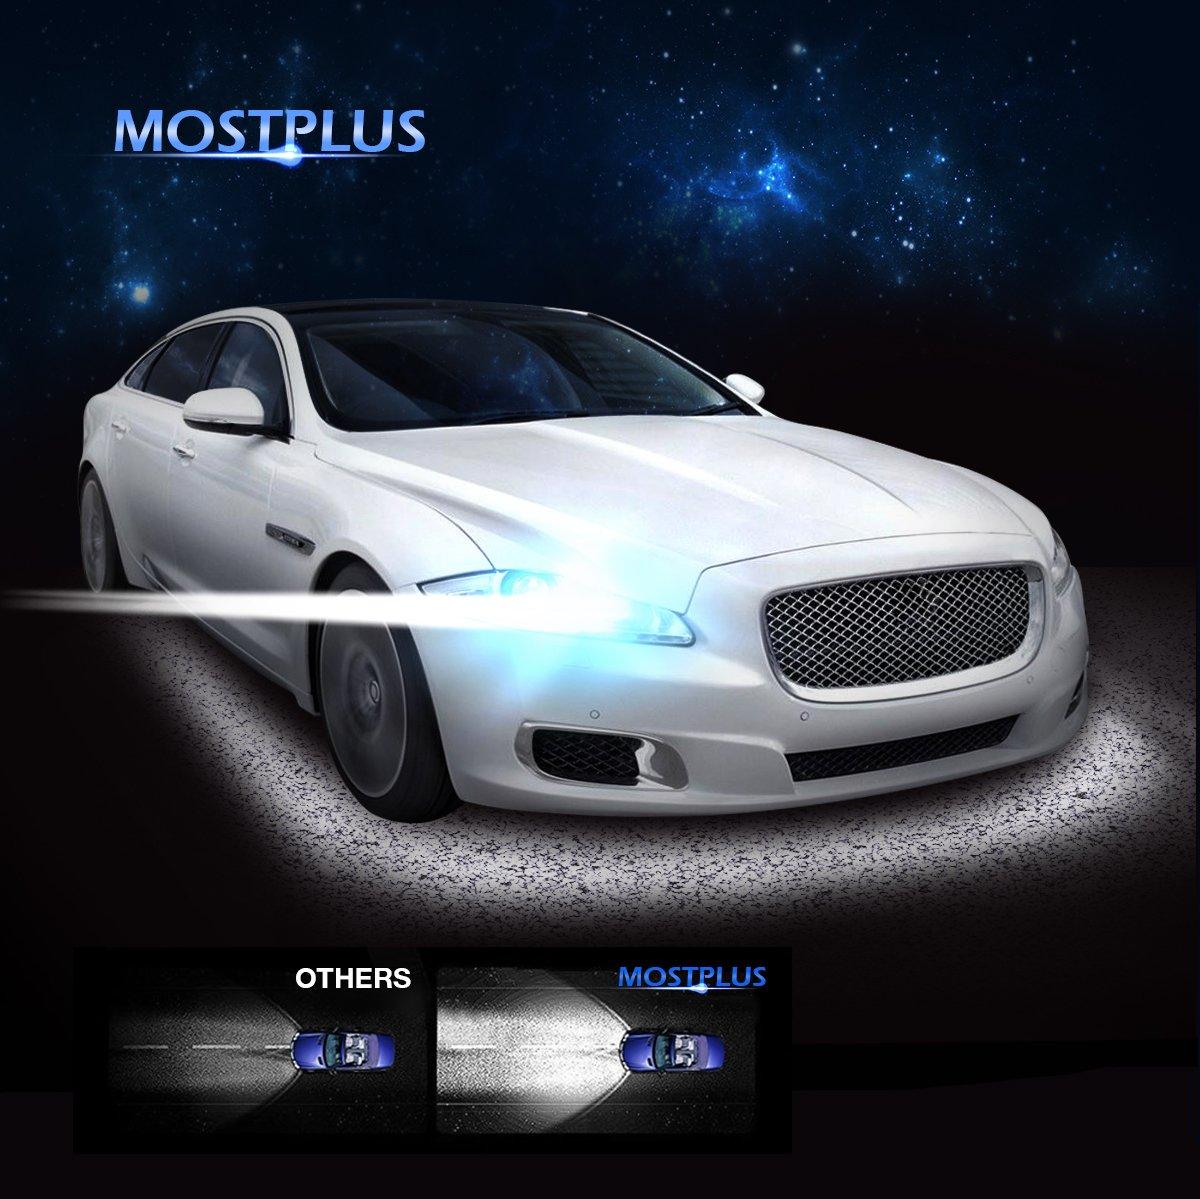 XHP50 + XM-L2 9008 Hi//Lo Beam Bulbs 50W 5,000lm Per Bulb-Cool White MOSTPLUS 10,000lm 6000K LED Headlight Conversion Kit H13